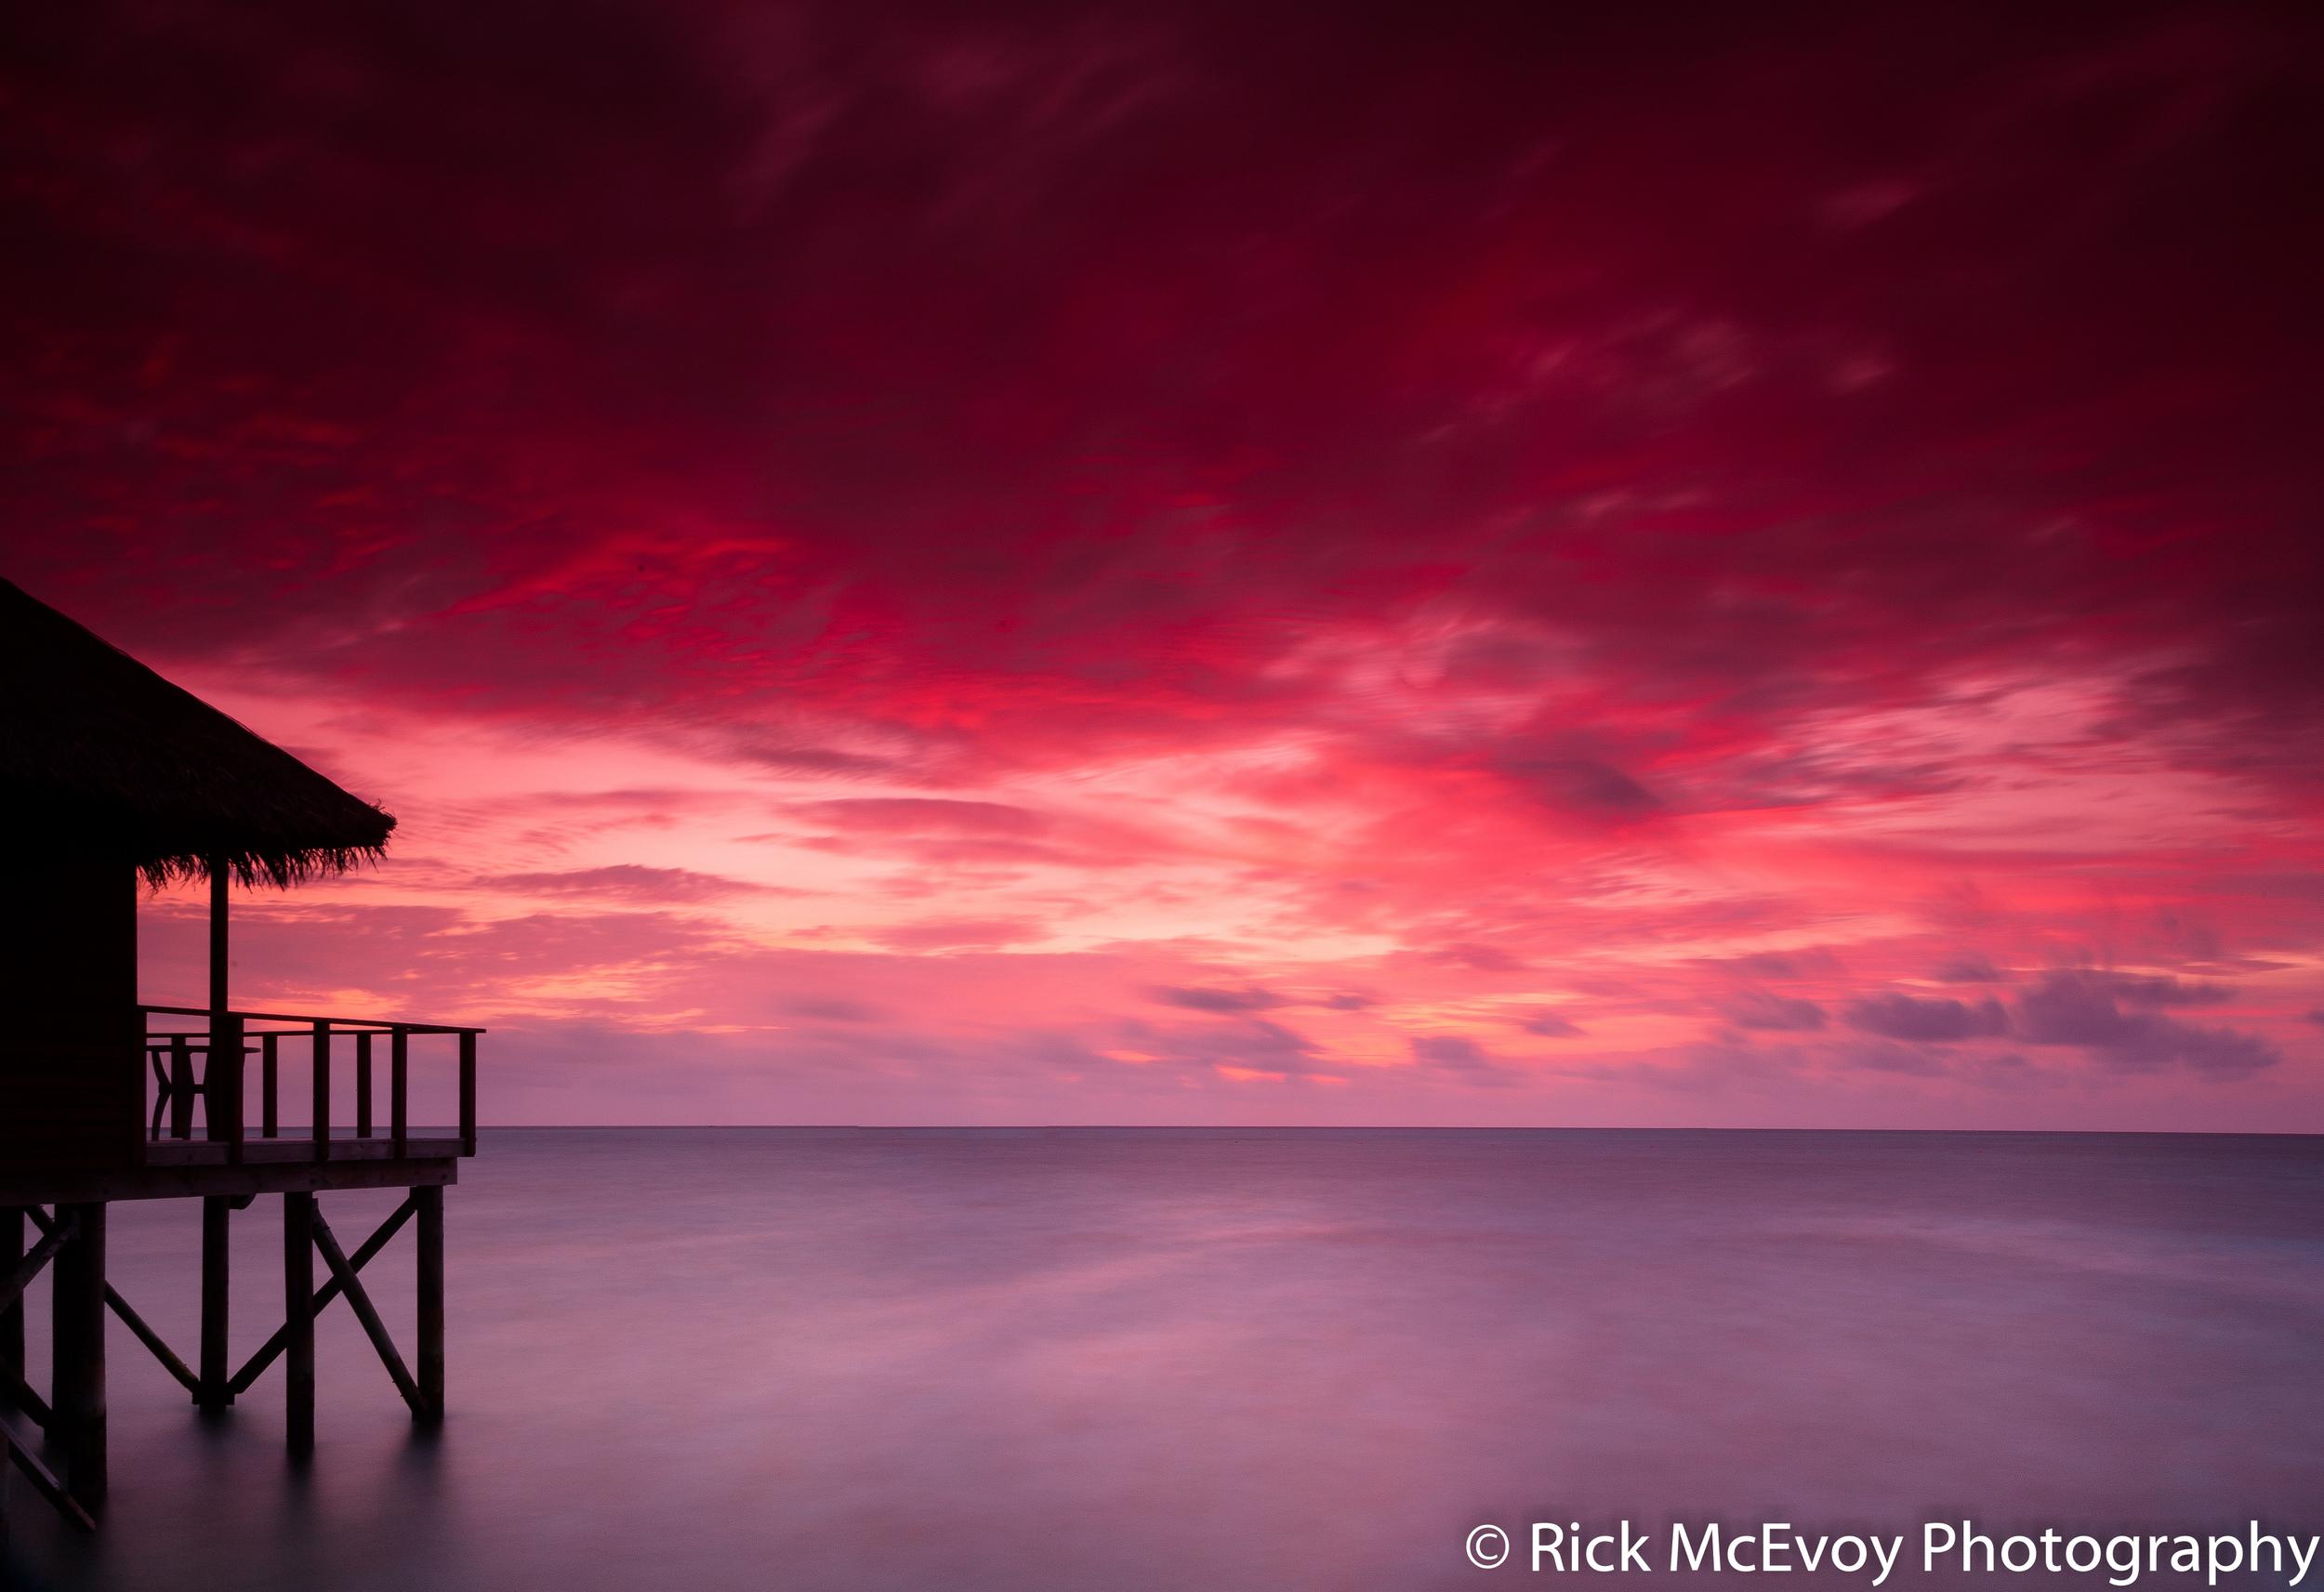 Maldives - fantastic shot by fantastic photographer Rick McEvoy